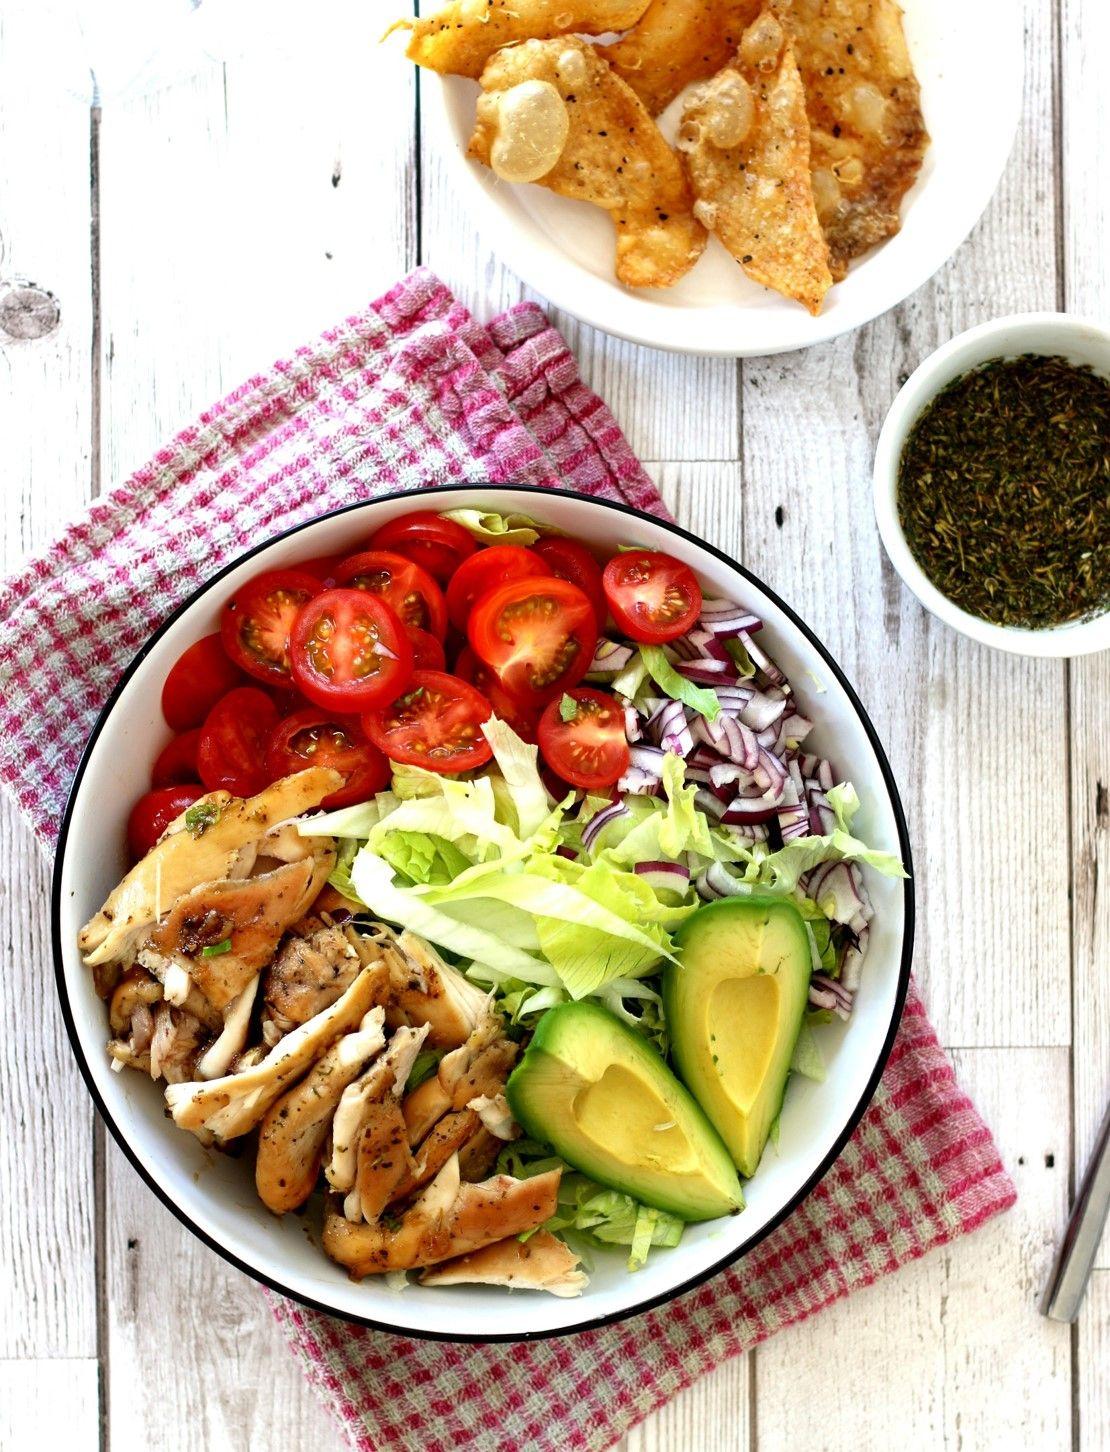 chicken-avocado-salad-crsipy-crackling-recipe-tiny-budget-cooking.jpg